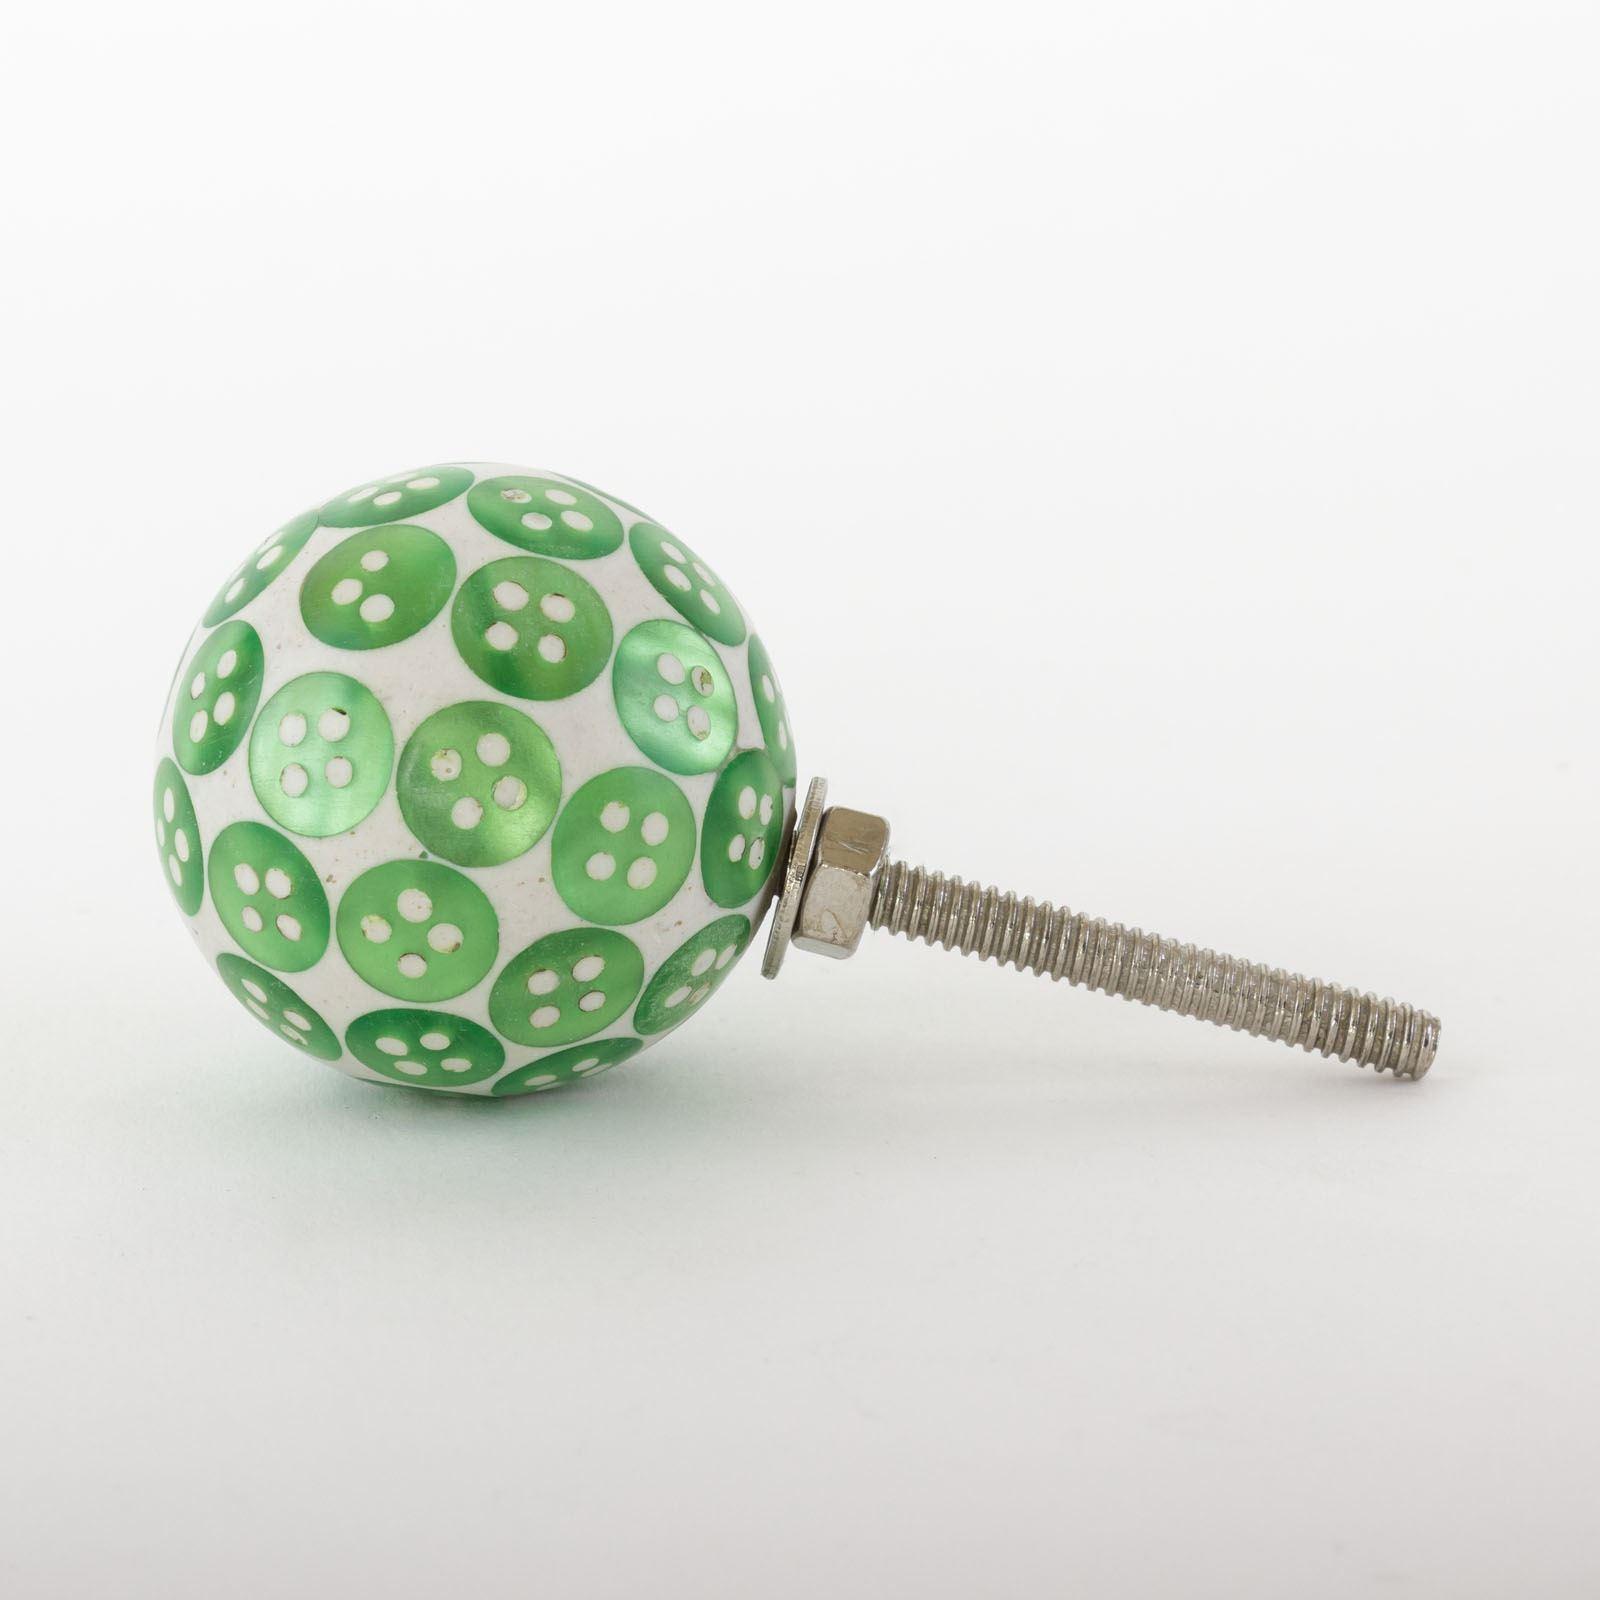 Dots-amp-Stripes-Ceramic-Door-Knobs-Handles-Furniture-Drawer-Pulls-Cupboard miniatura 39